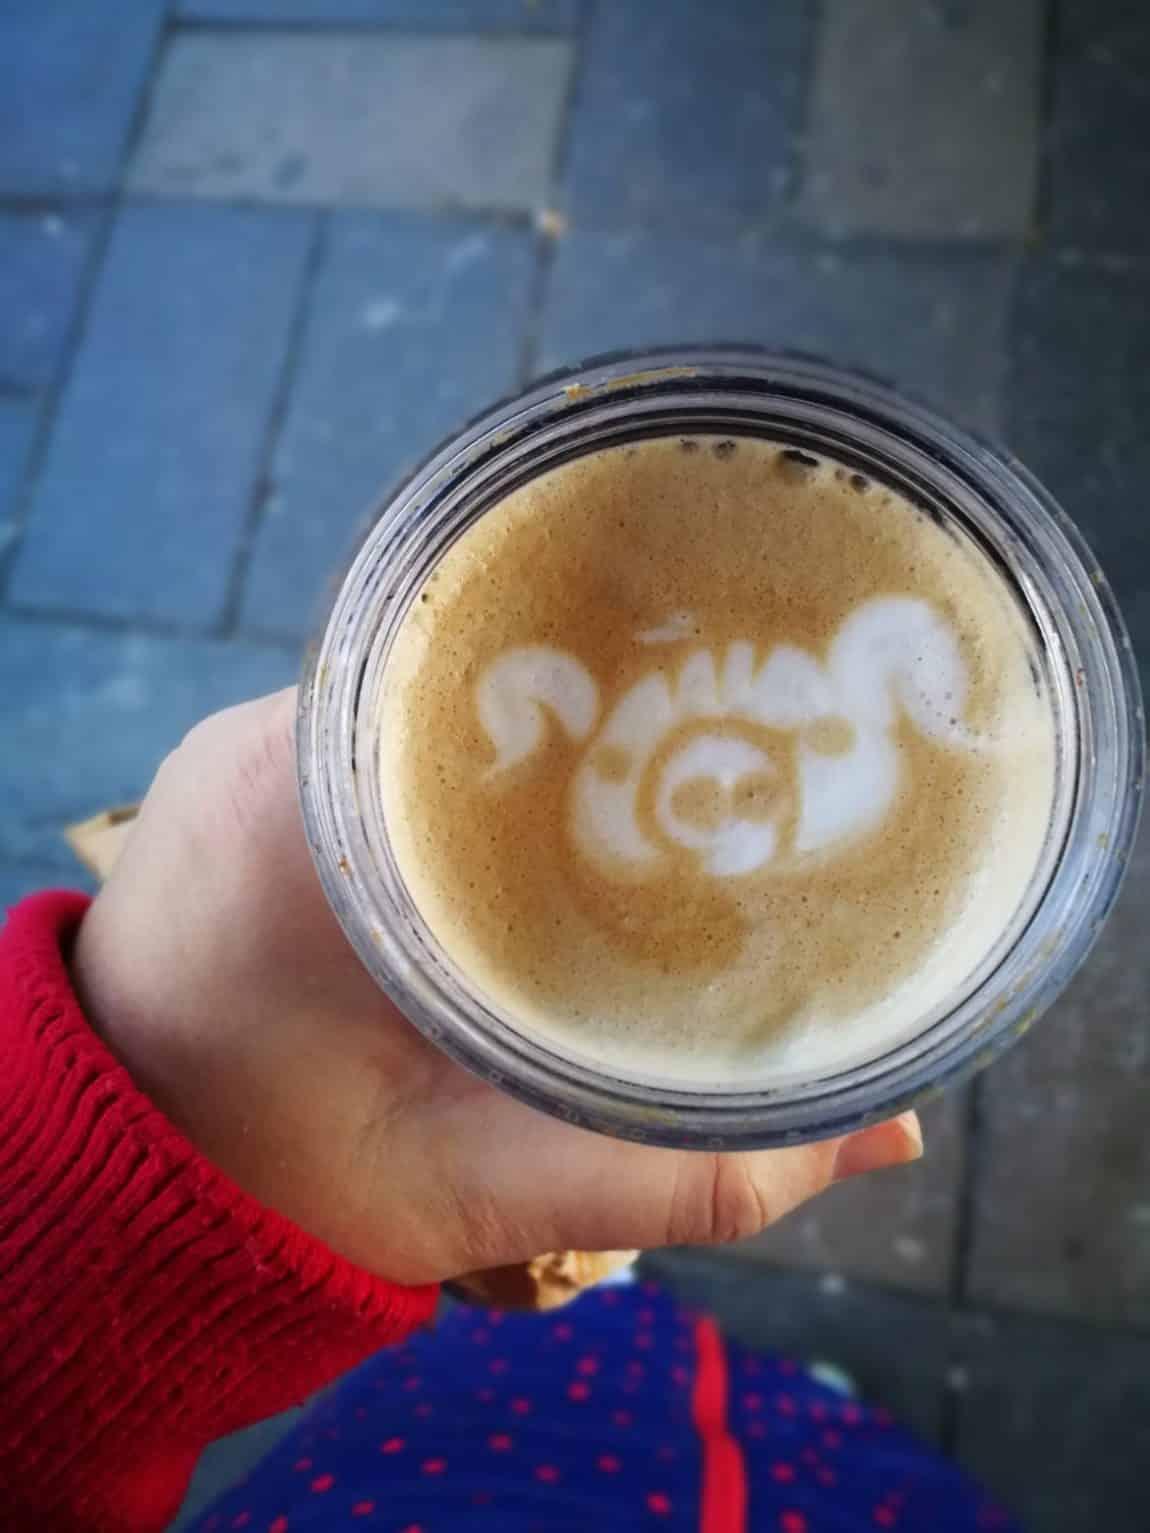 Kaffee mit Bild Barista grossekoepfe